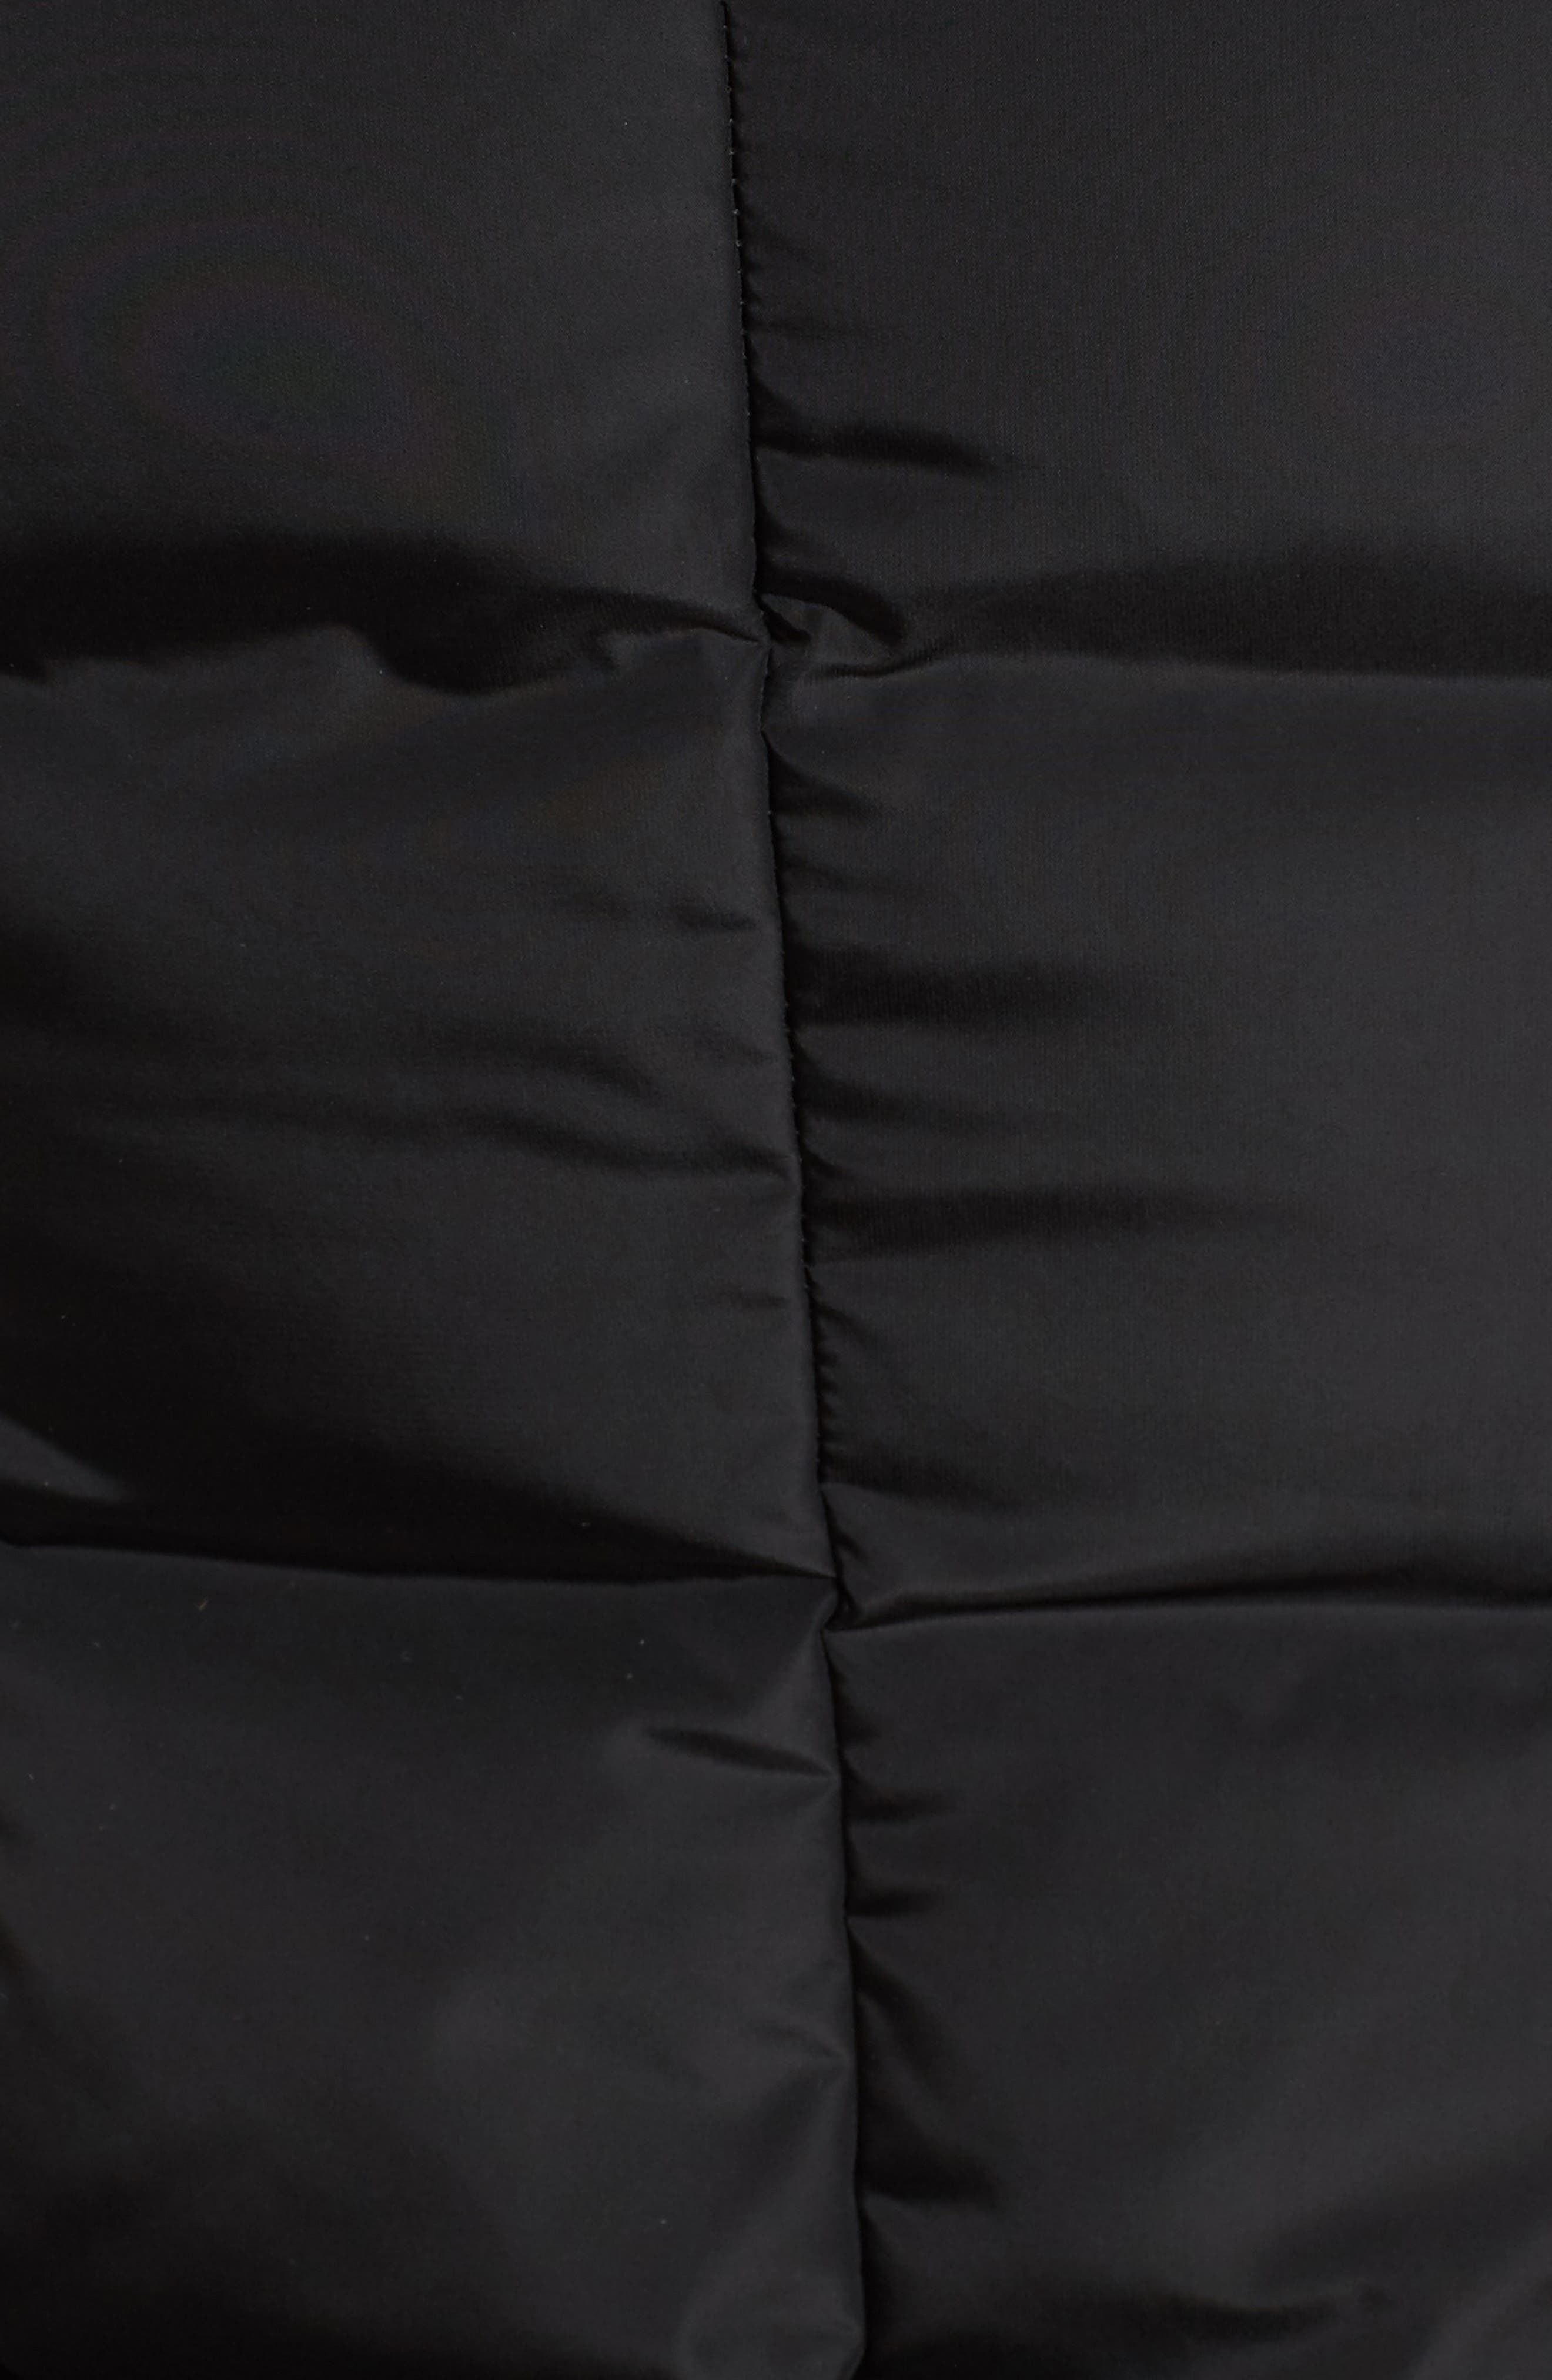 MACKAGE, Hooded Down Parka with Inset Bib & Genuine Fox Fur Trim, Alternate thumbnail 6, color, 001